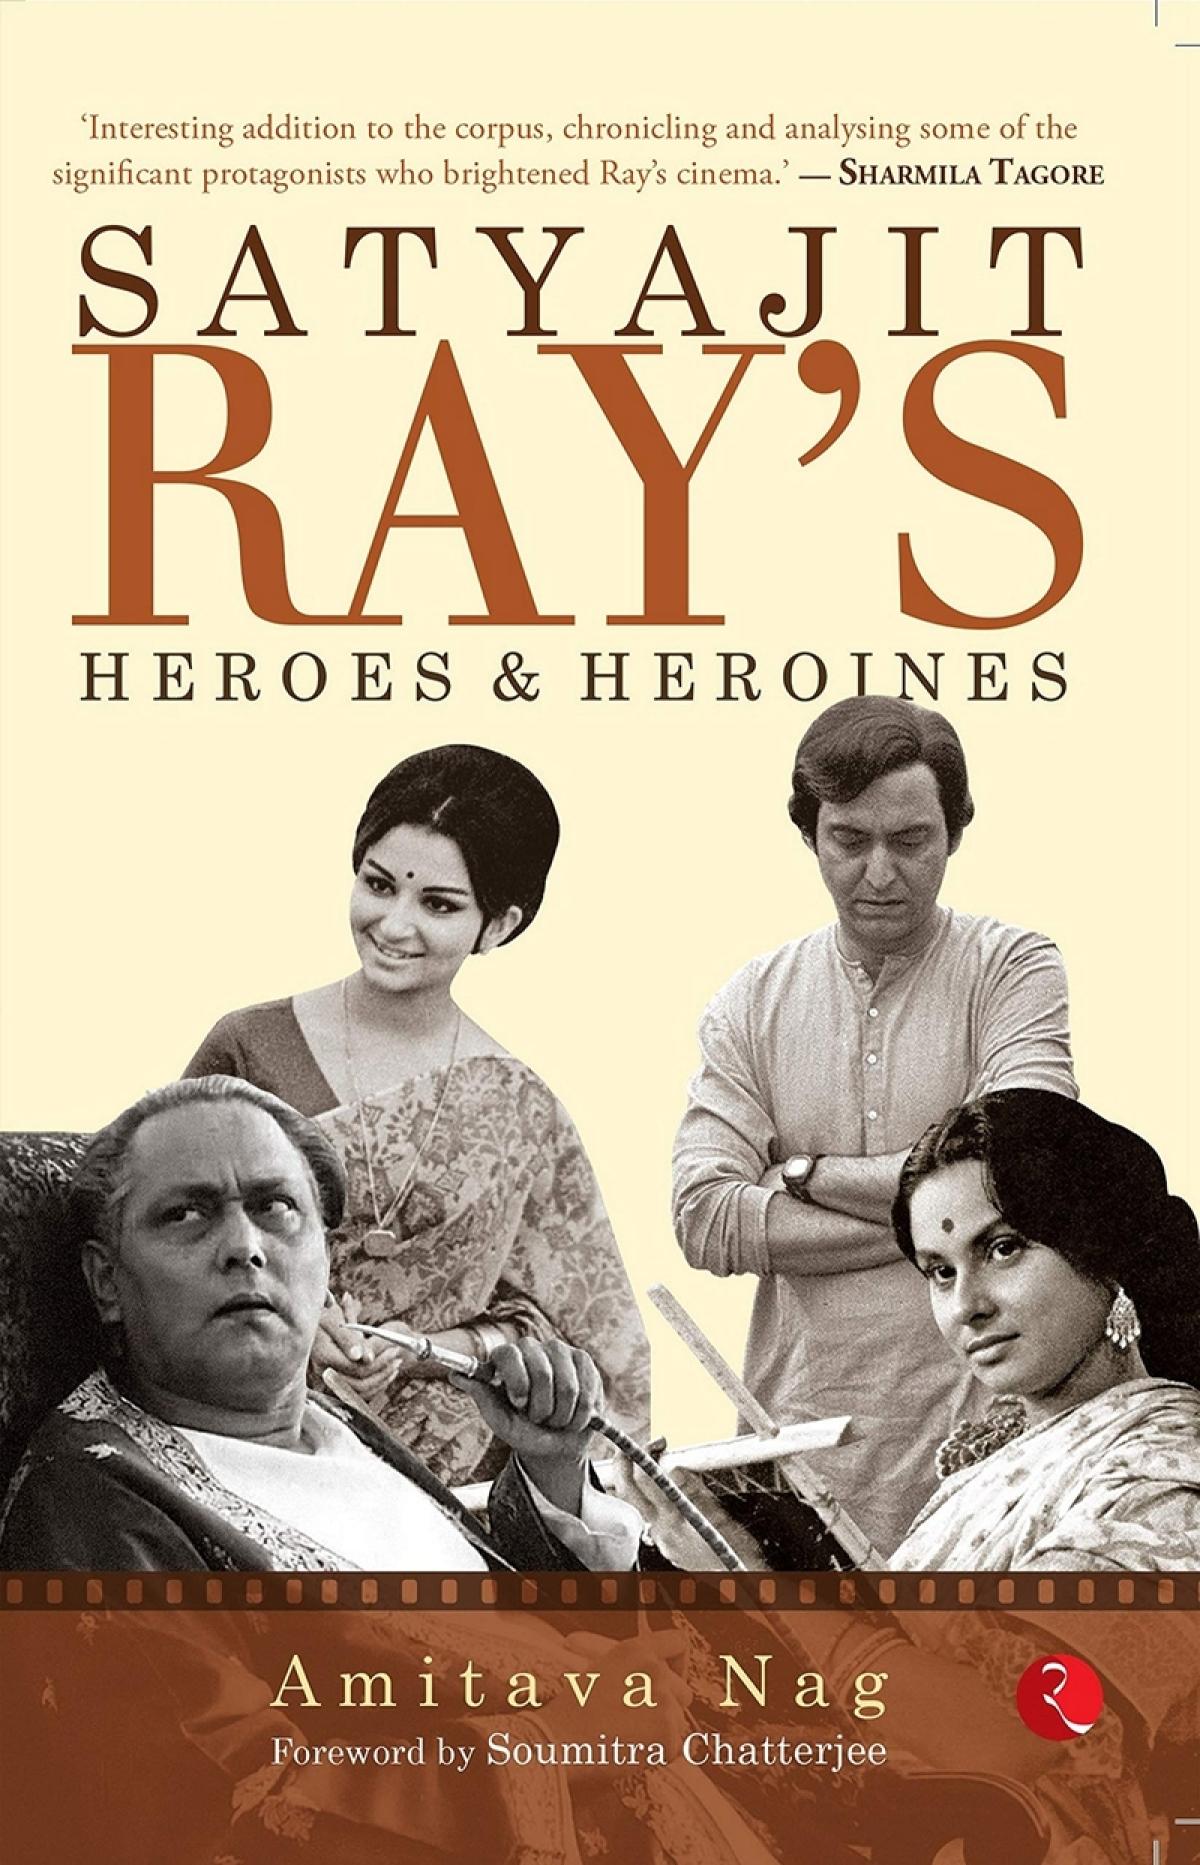 Satyajit Ray's Heroes and Heroines by Amitava Nag: Review